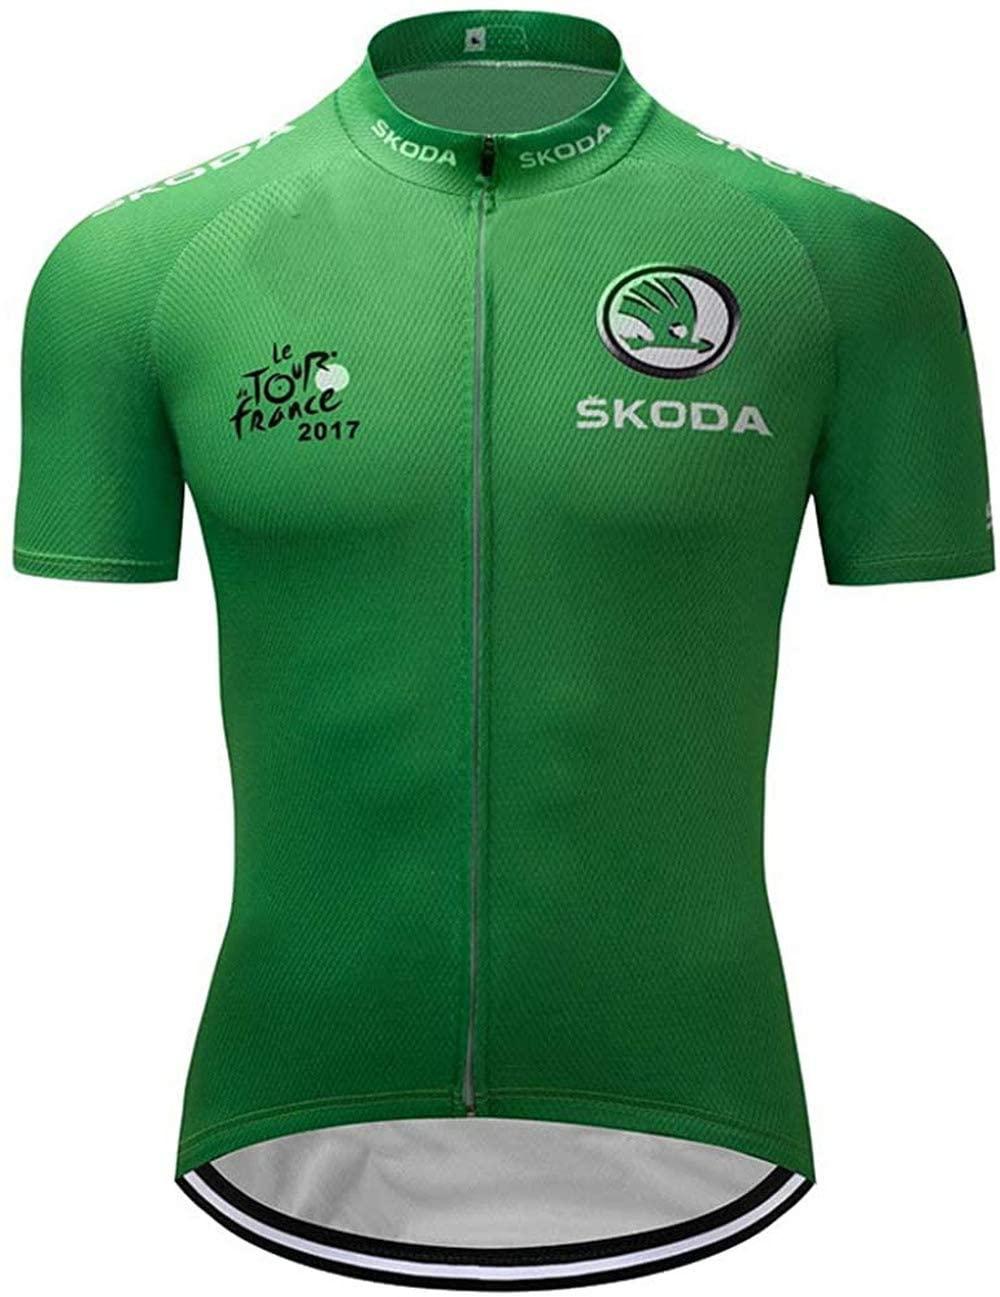 Via Inc. Cycling Jerseys Men's Bicycle Jersey Summer Breathable Jersey Bike Biking Shirt O005